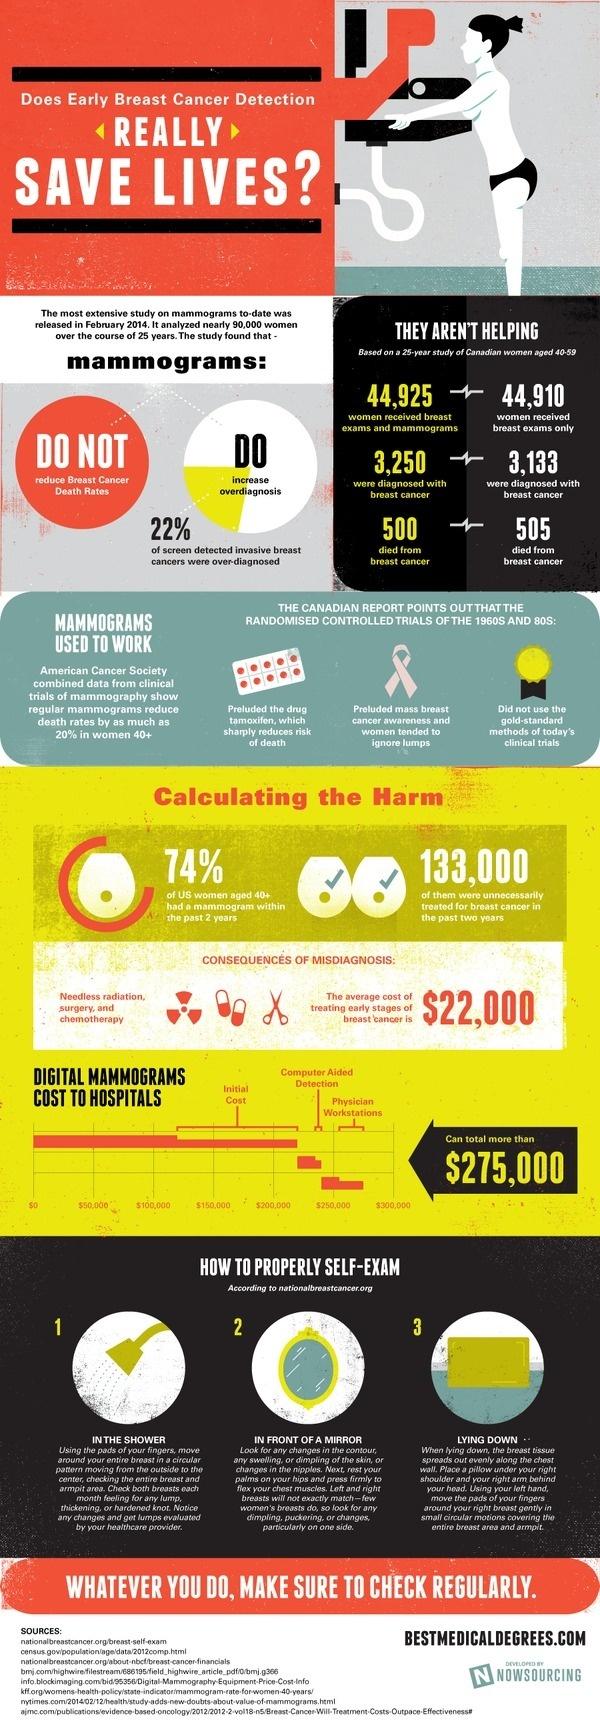 Do Mammograms Save Lives? #breast #mammograms #cancer